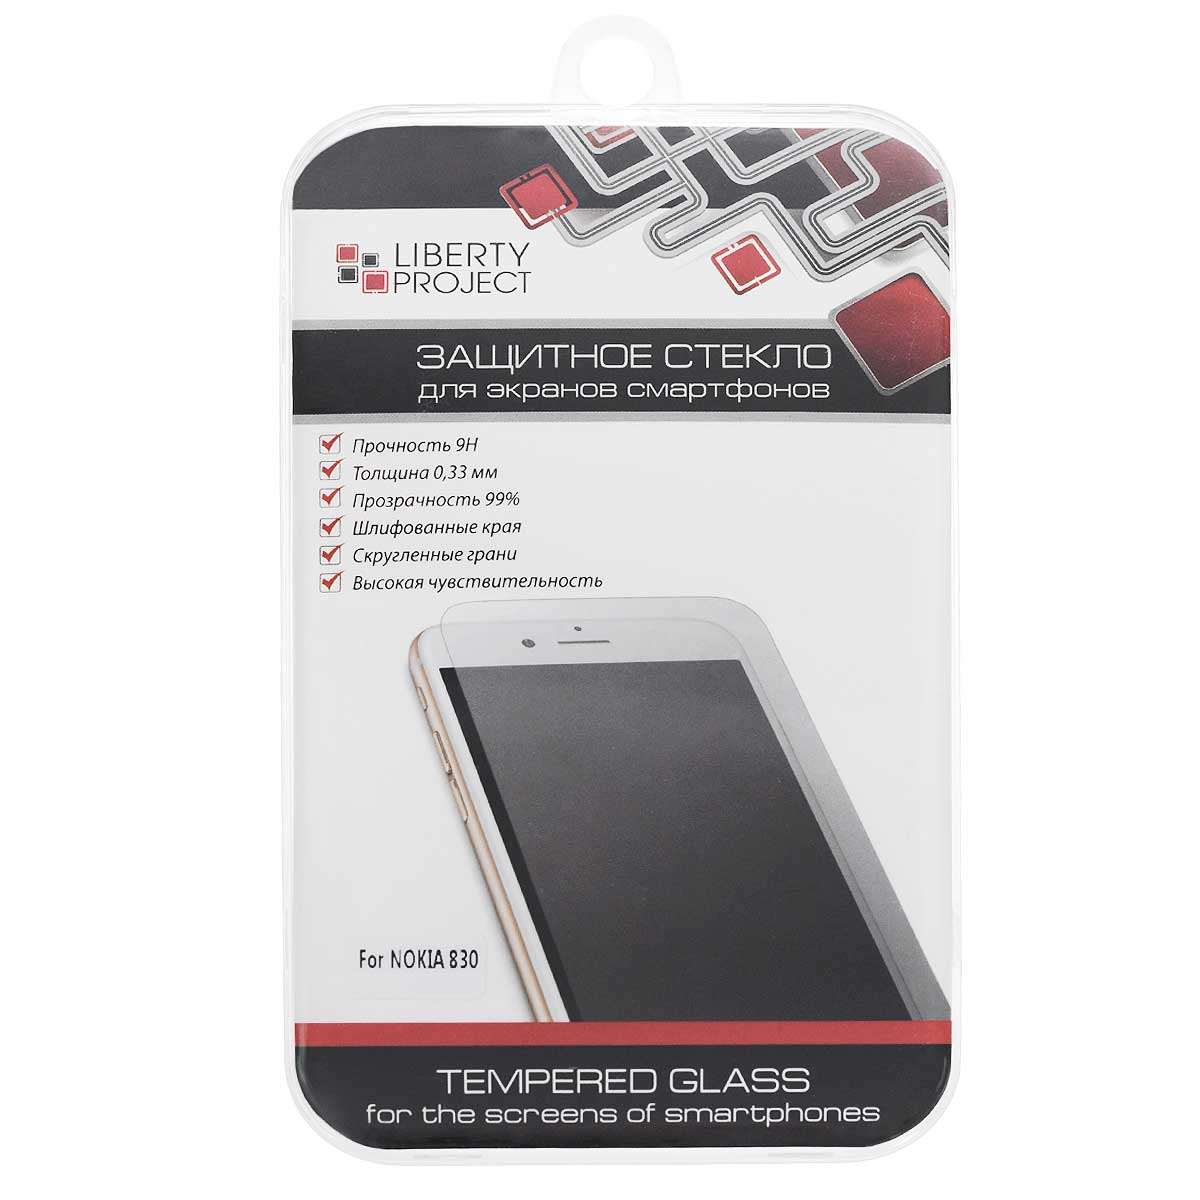 Liberty Project Tempered Glass защитное стекло для Nokia 830, Clear (0,33 мм) liberty project чехол флип для nokia lumia 830 black